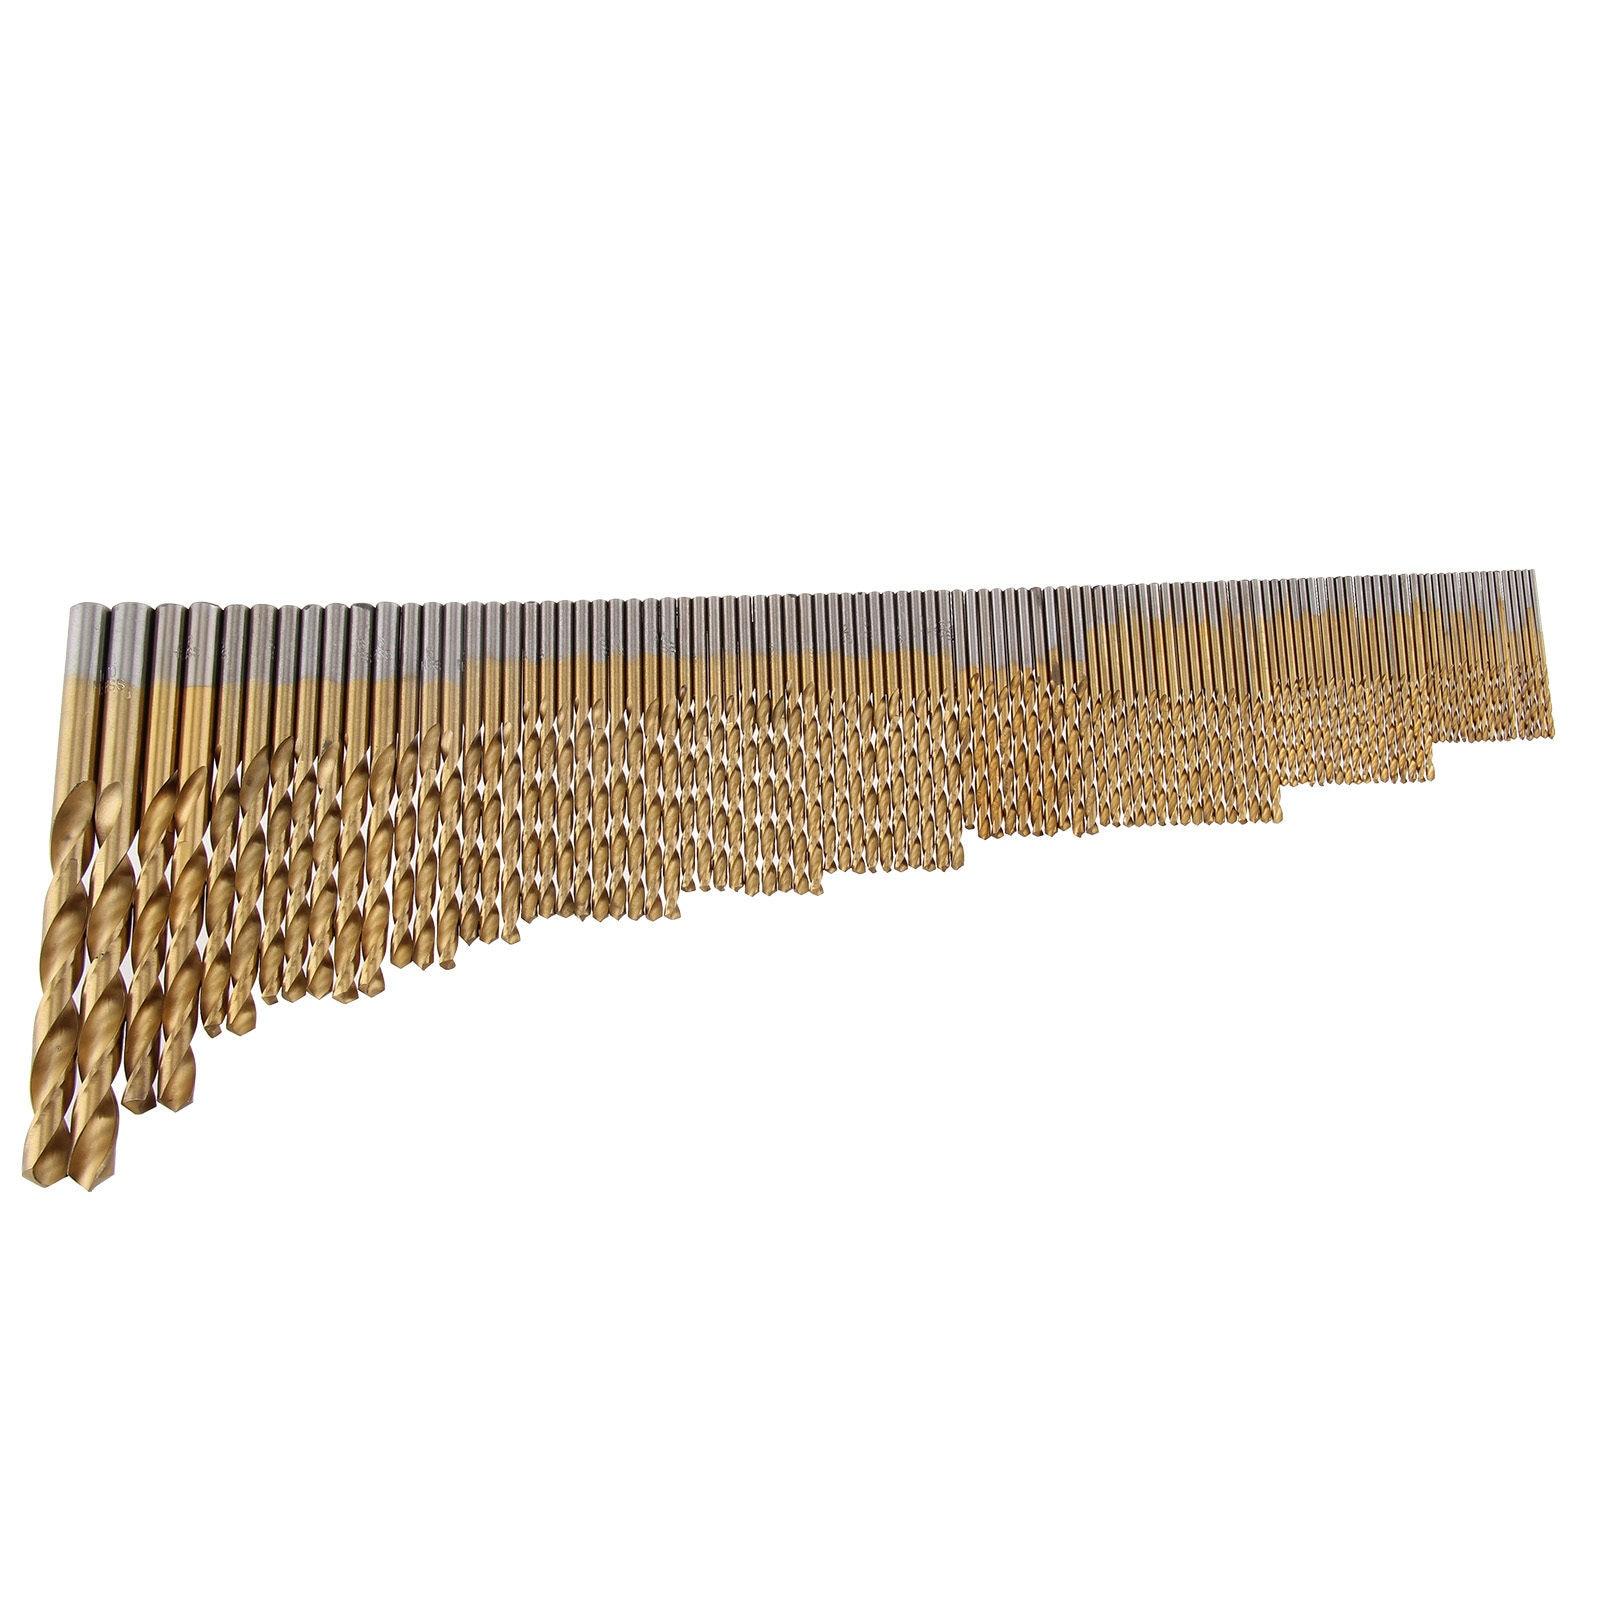 105pc Drill Bits Set For Stainless Steel Metal HSS-Co Cobalt Bit Titanium